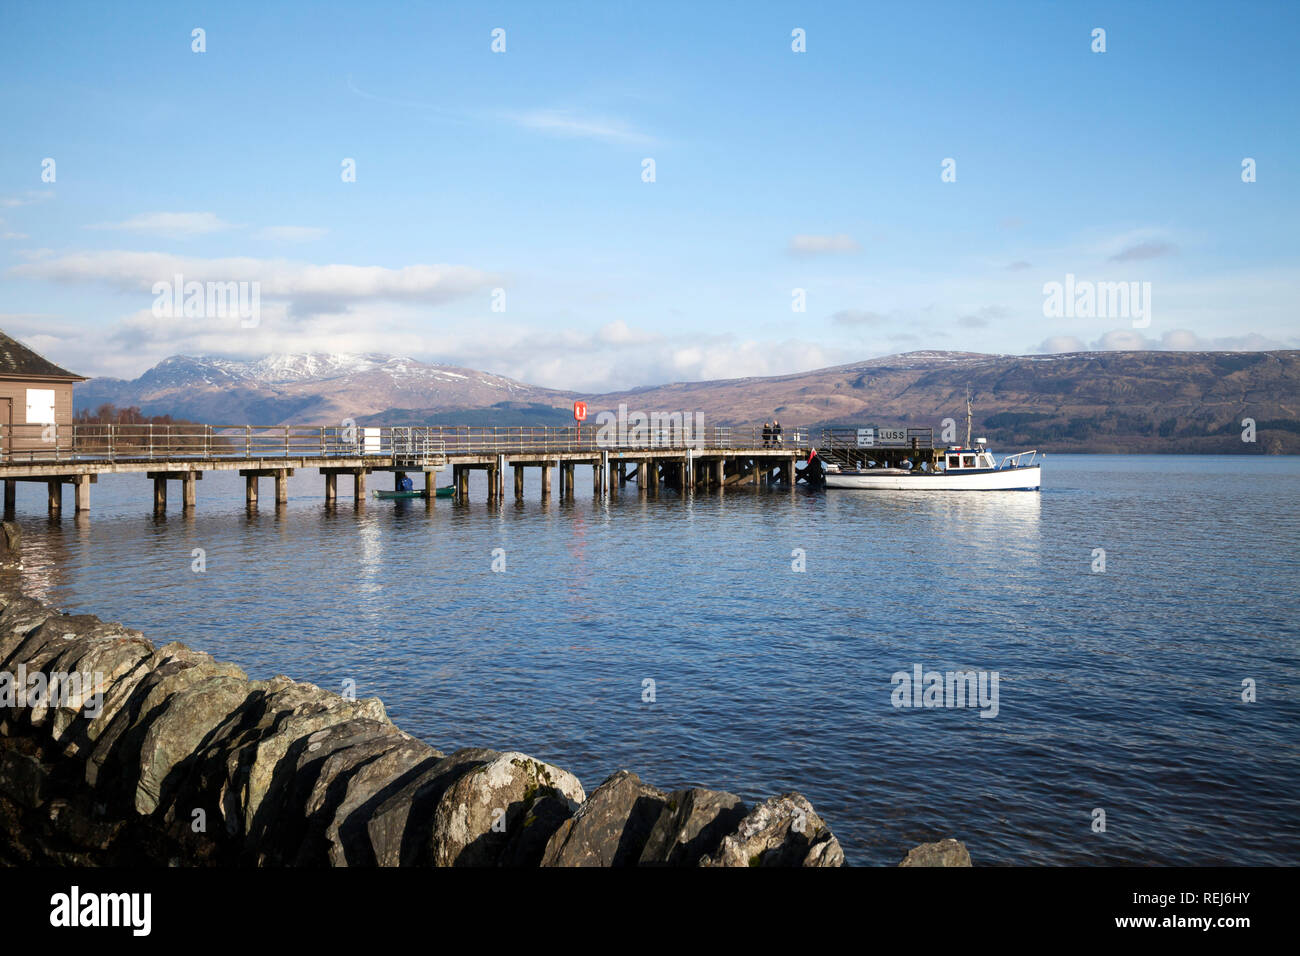 Water taxi at Luss Pier on Loch Lomond, Argyll, Scotland - Stock Image